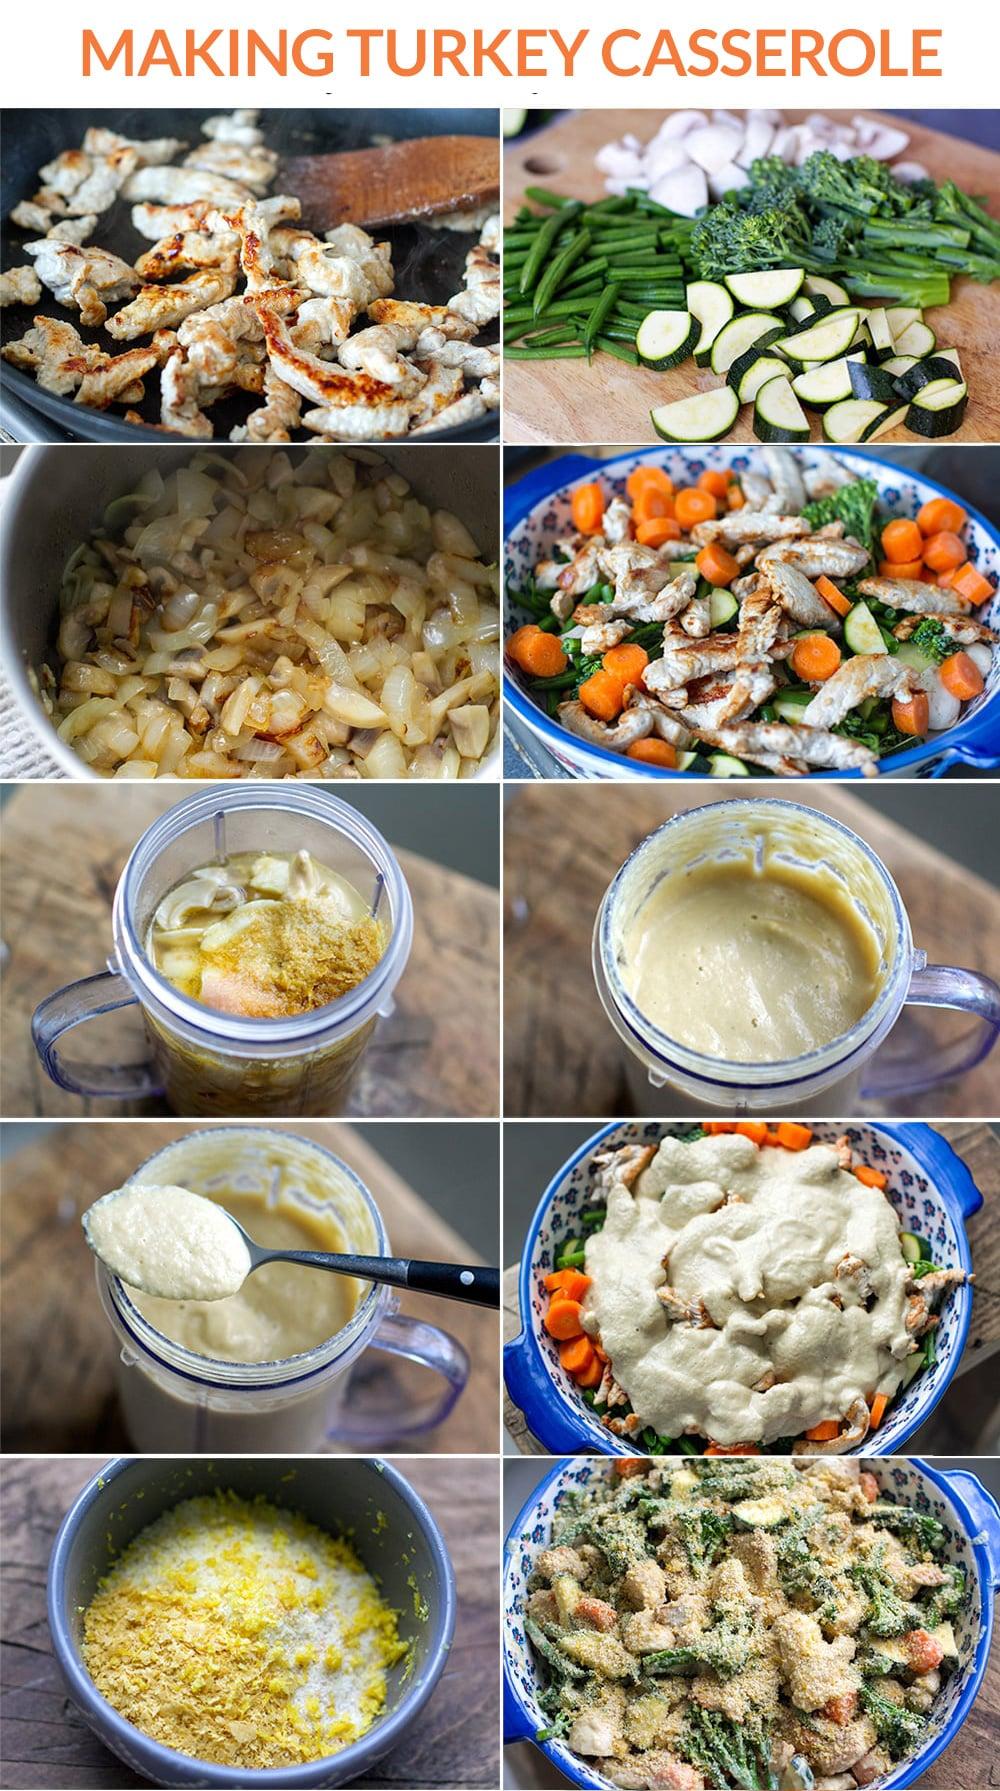 How to make a creamy, dairy-free paleo turkey broccoli casserole